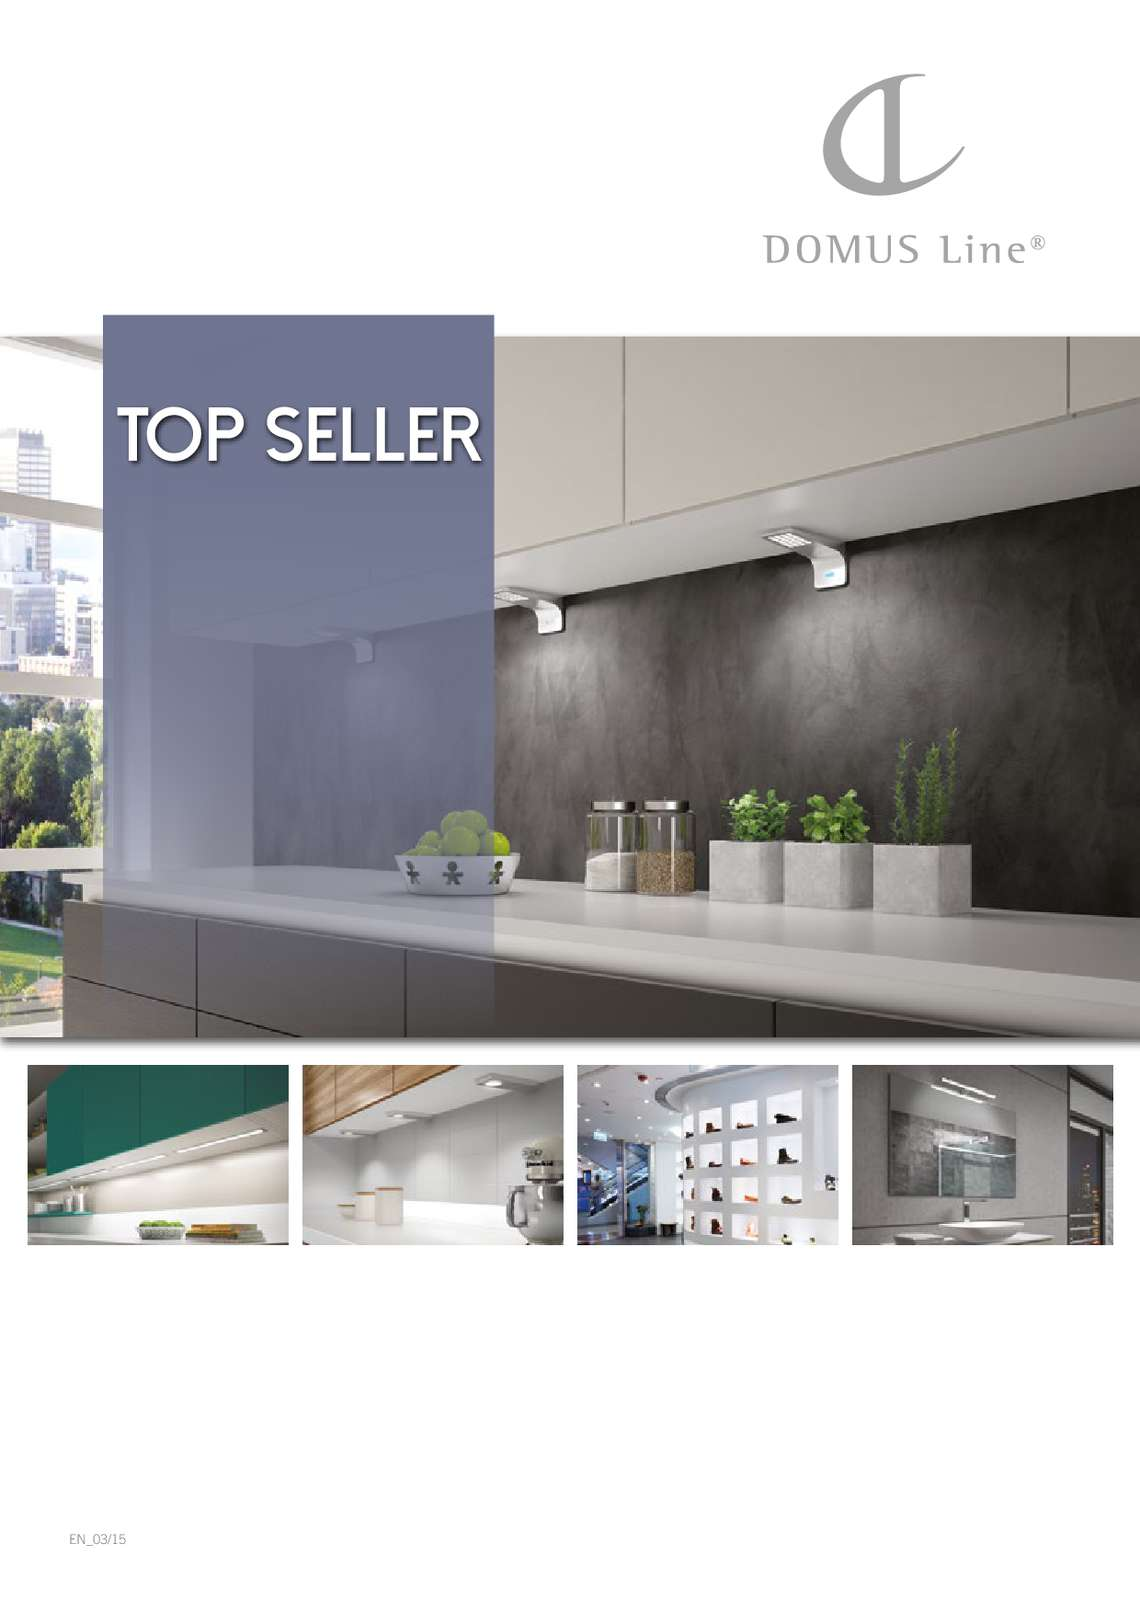 Domus Line Top Seller